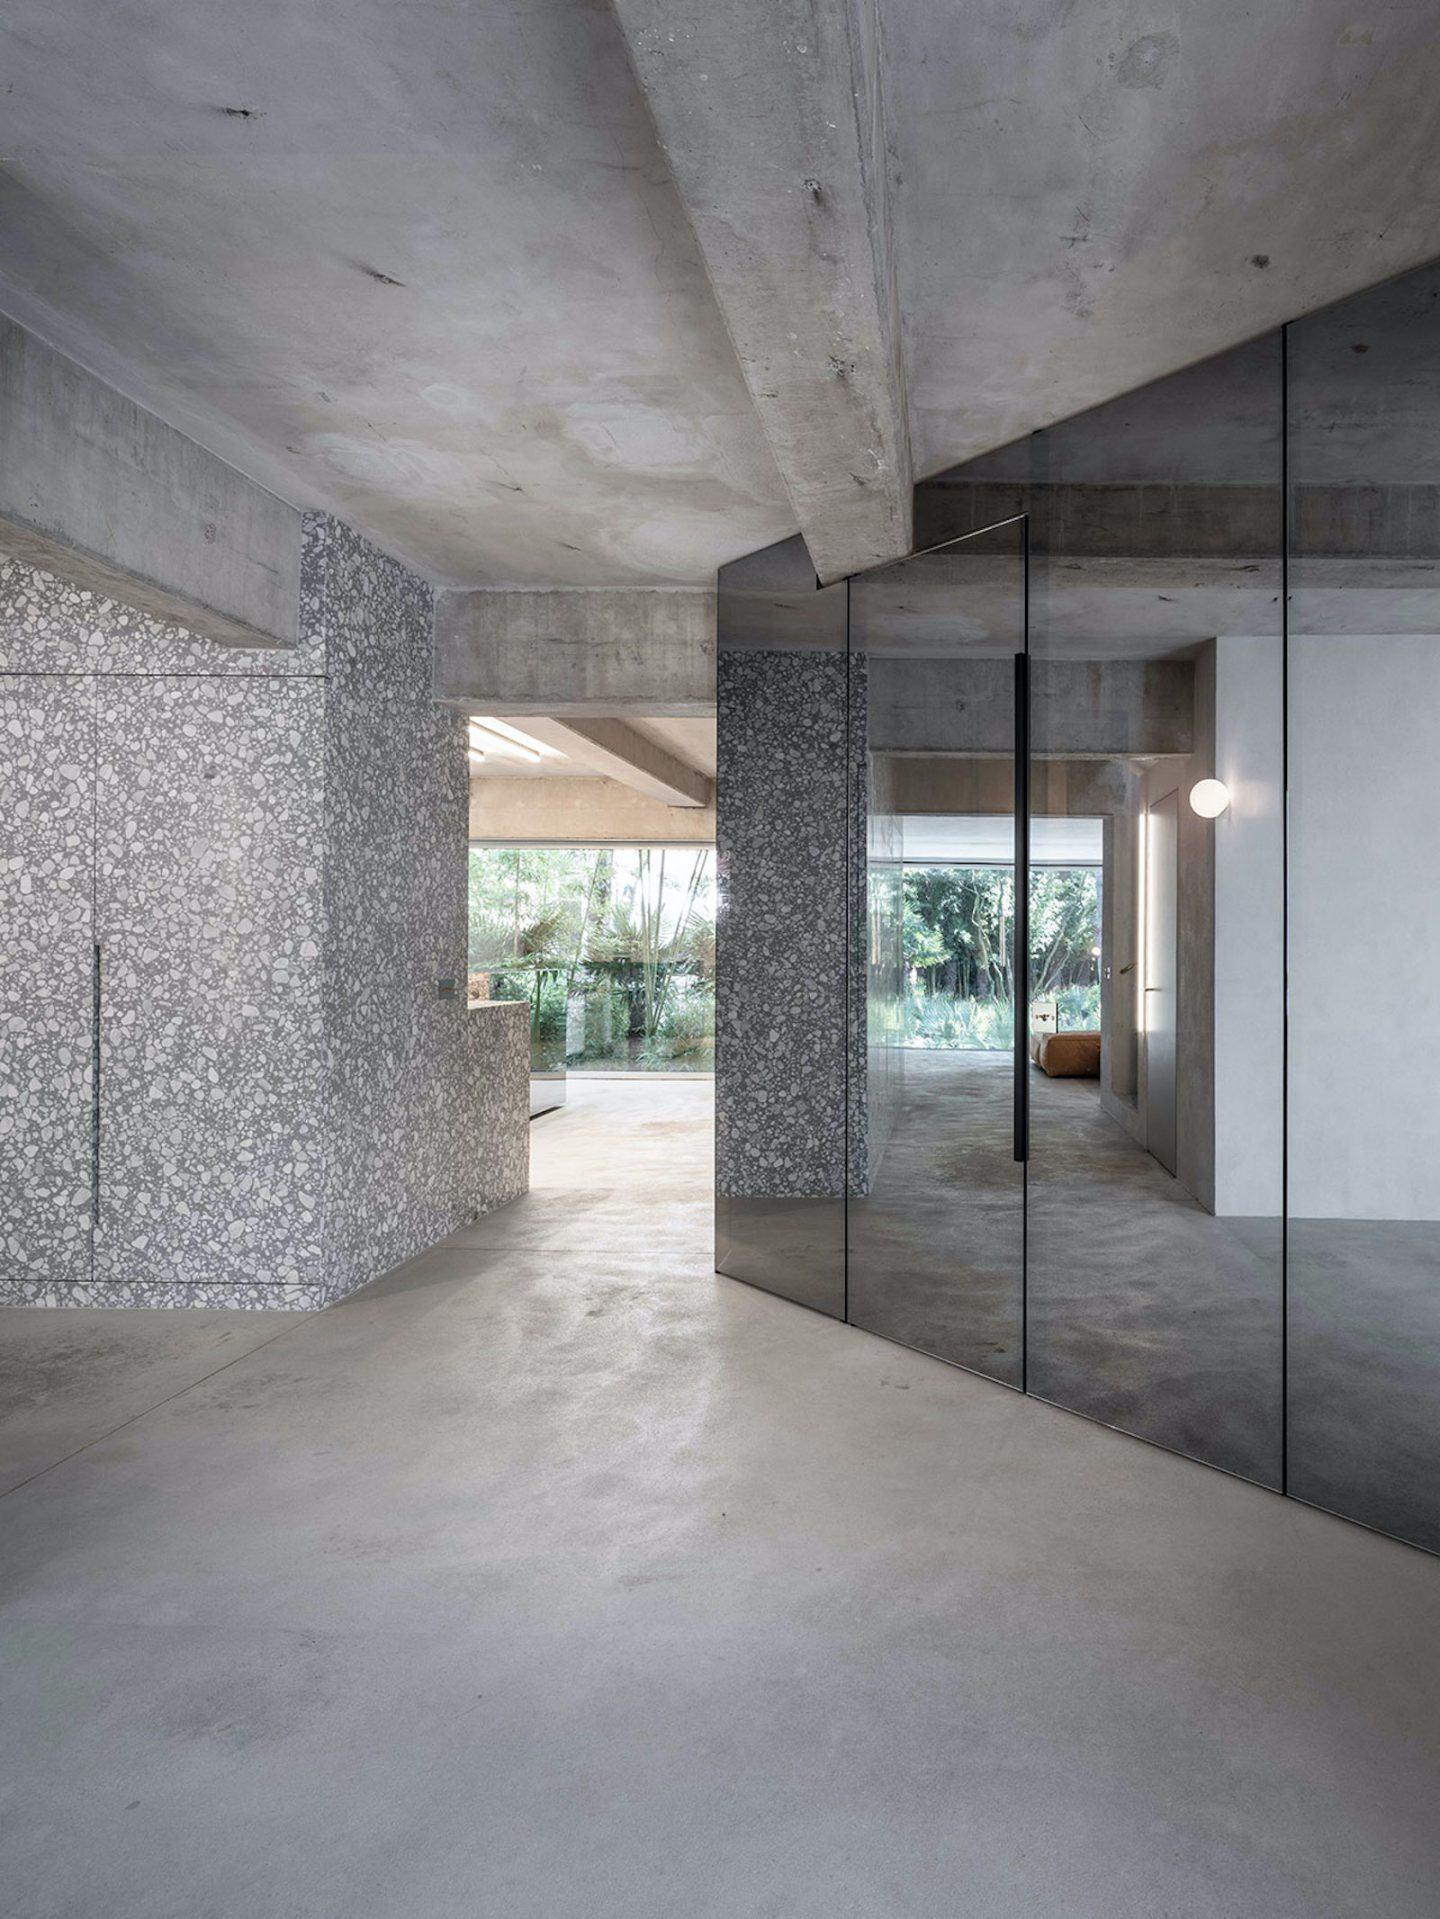 IGNANT-Architecture-JMayerH-Casa-Morgana-06